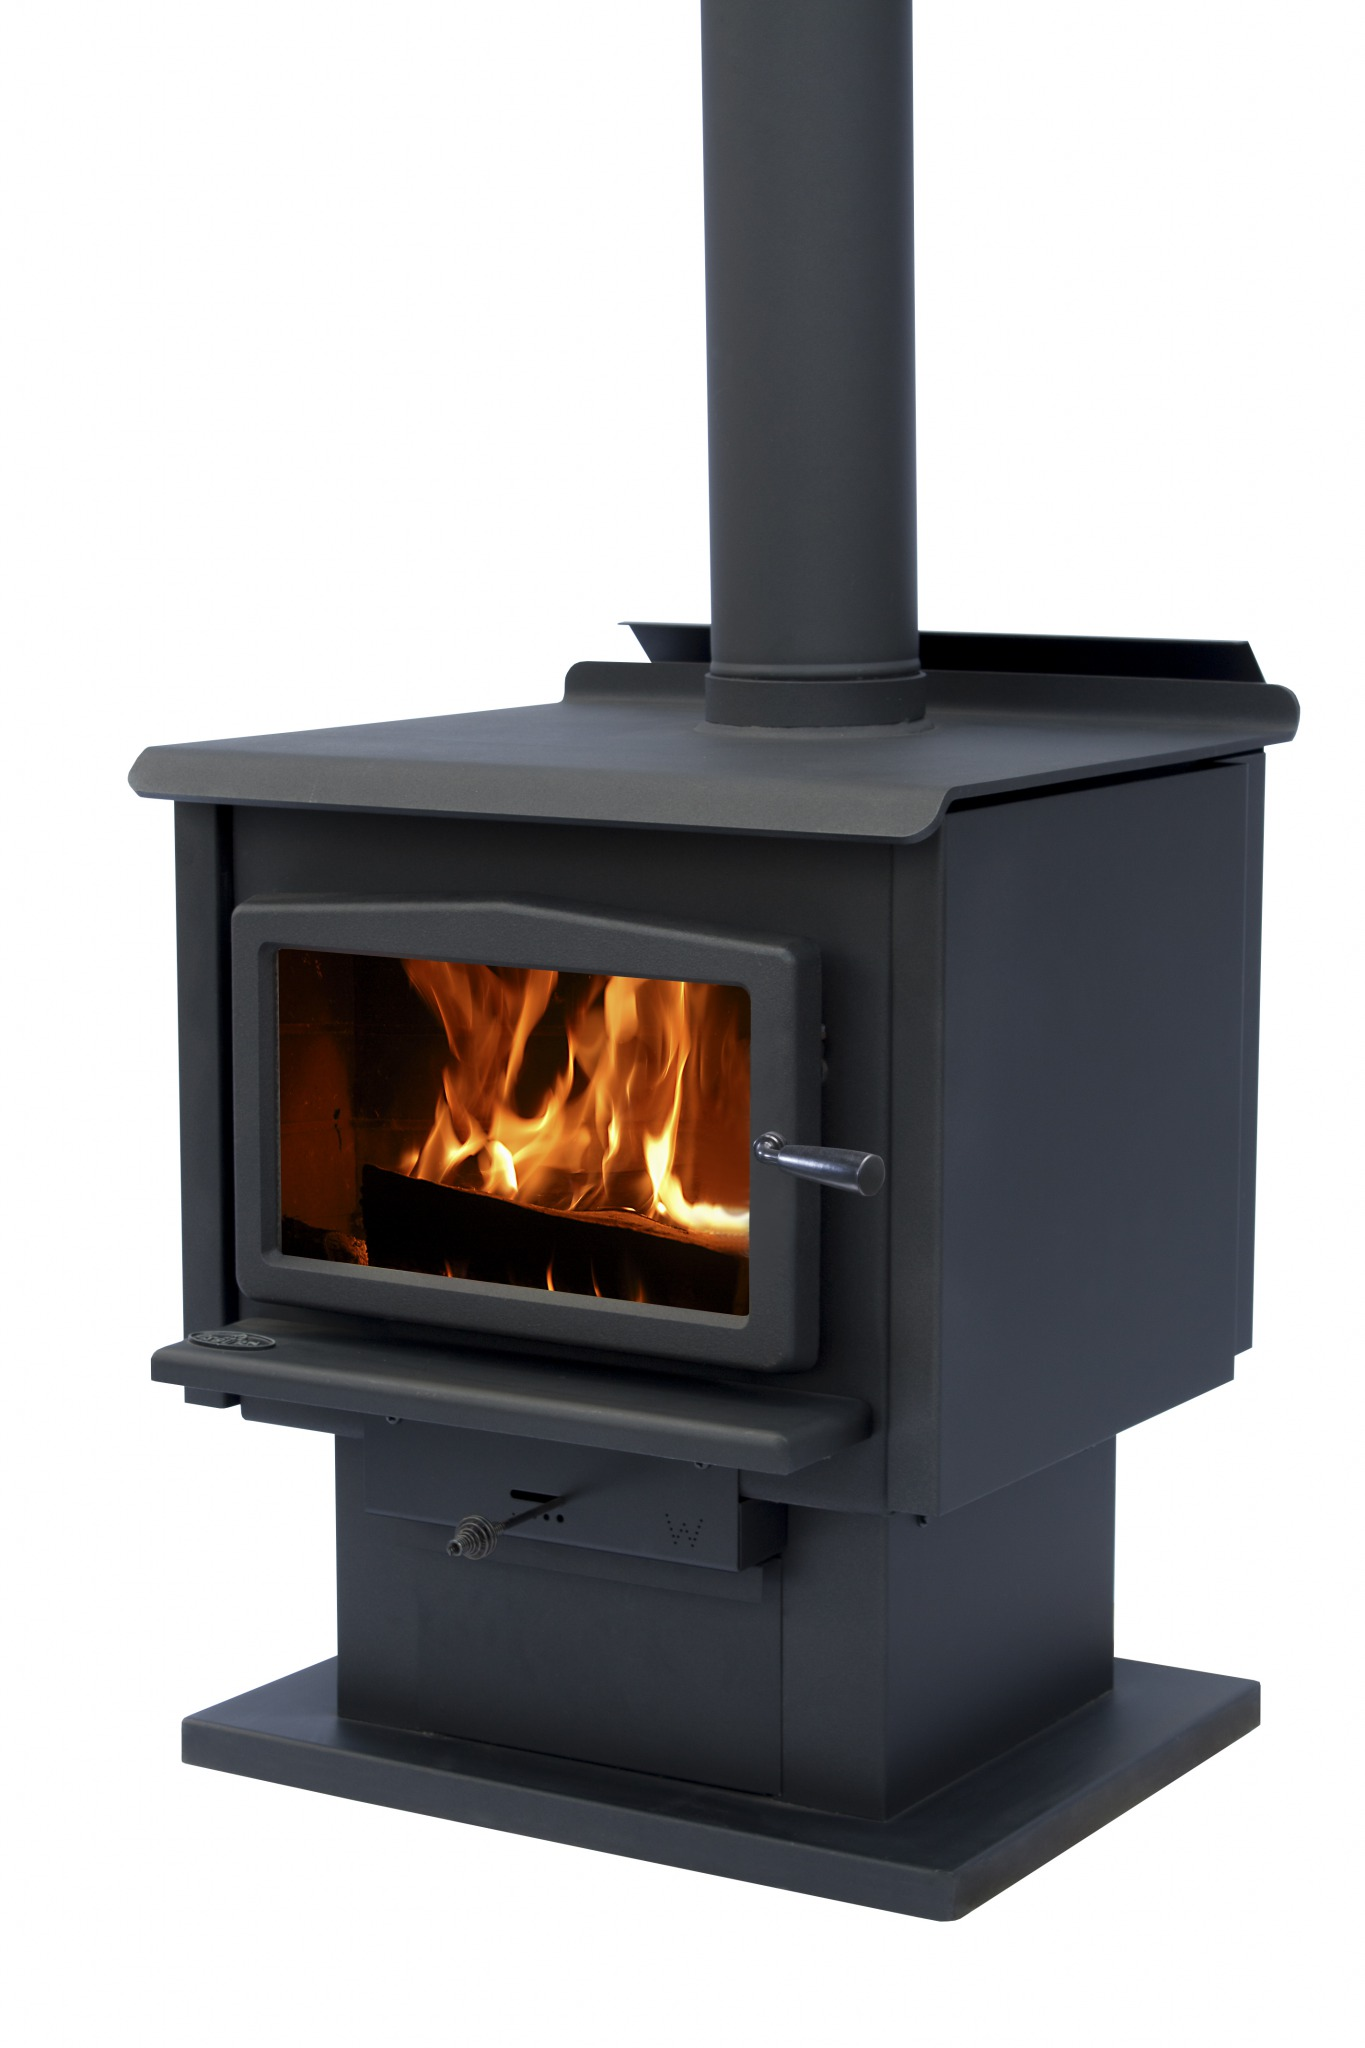 MASPORT OSBURN 1600 – Freestanding Wood Burner With Ash Pan